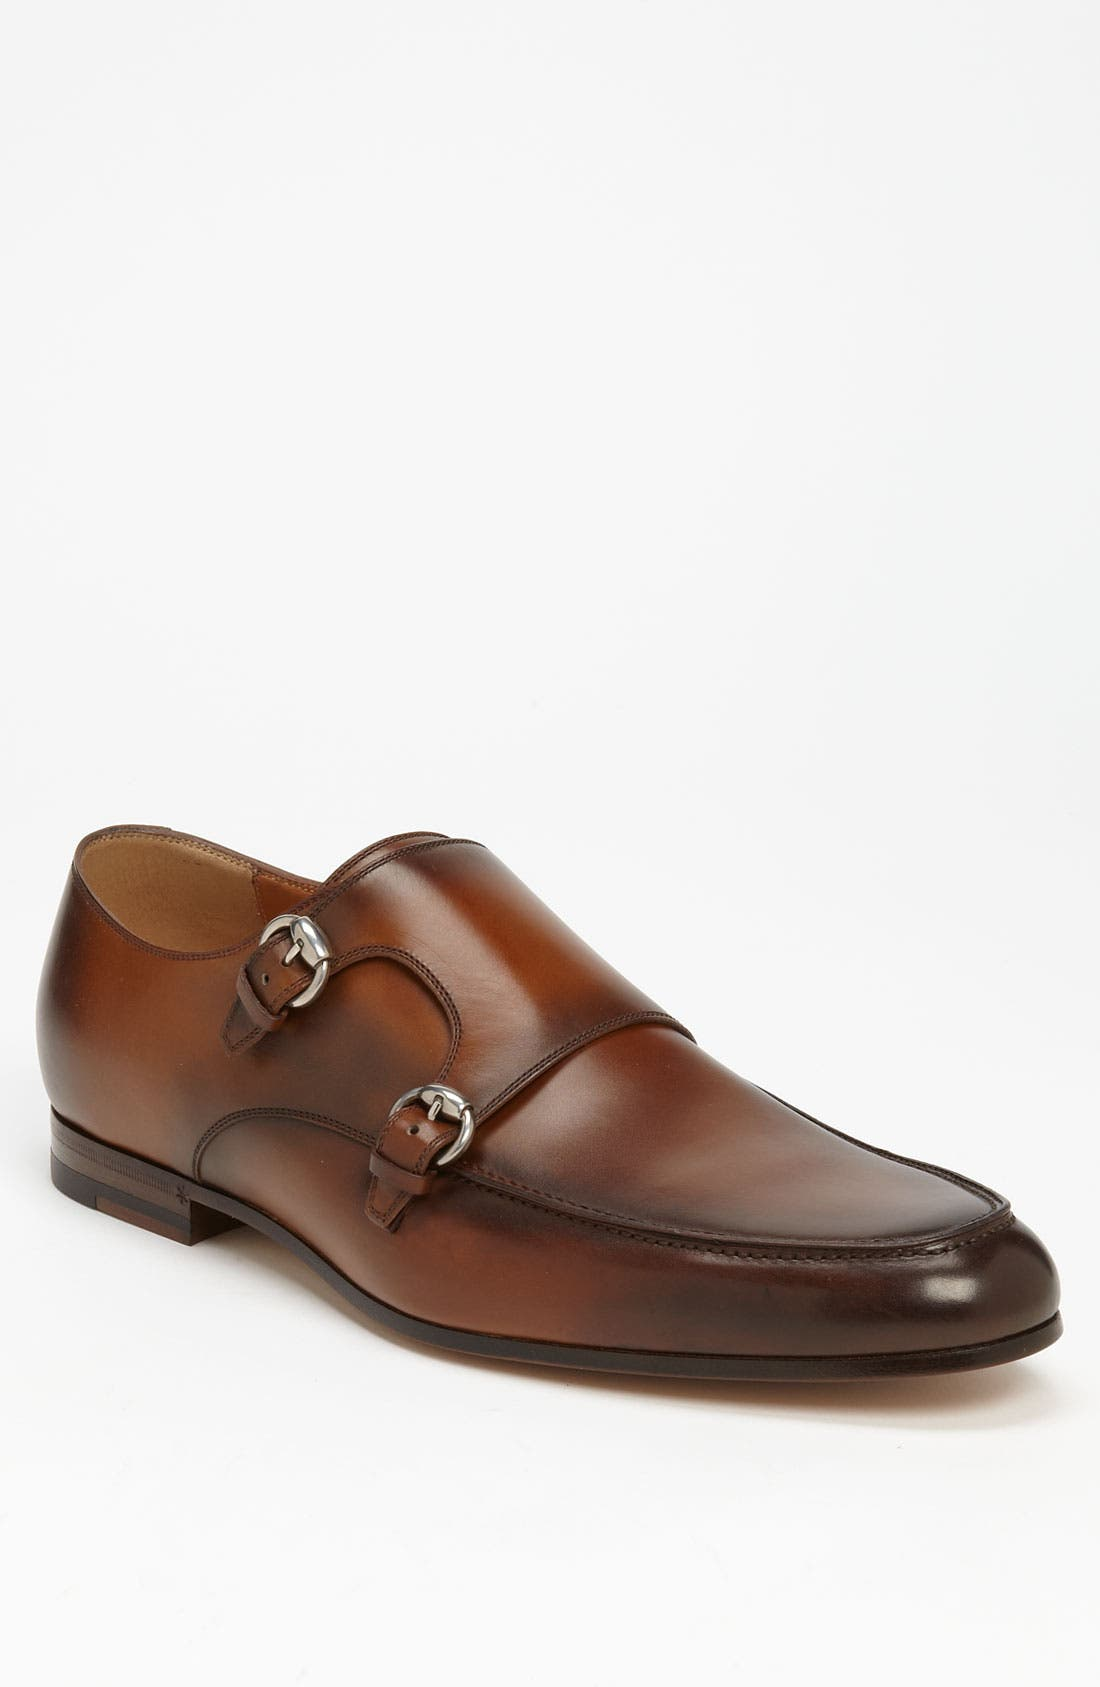 Main Image - Gucci 'Bonnard' Monk Strap Shoe